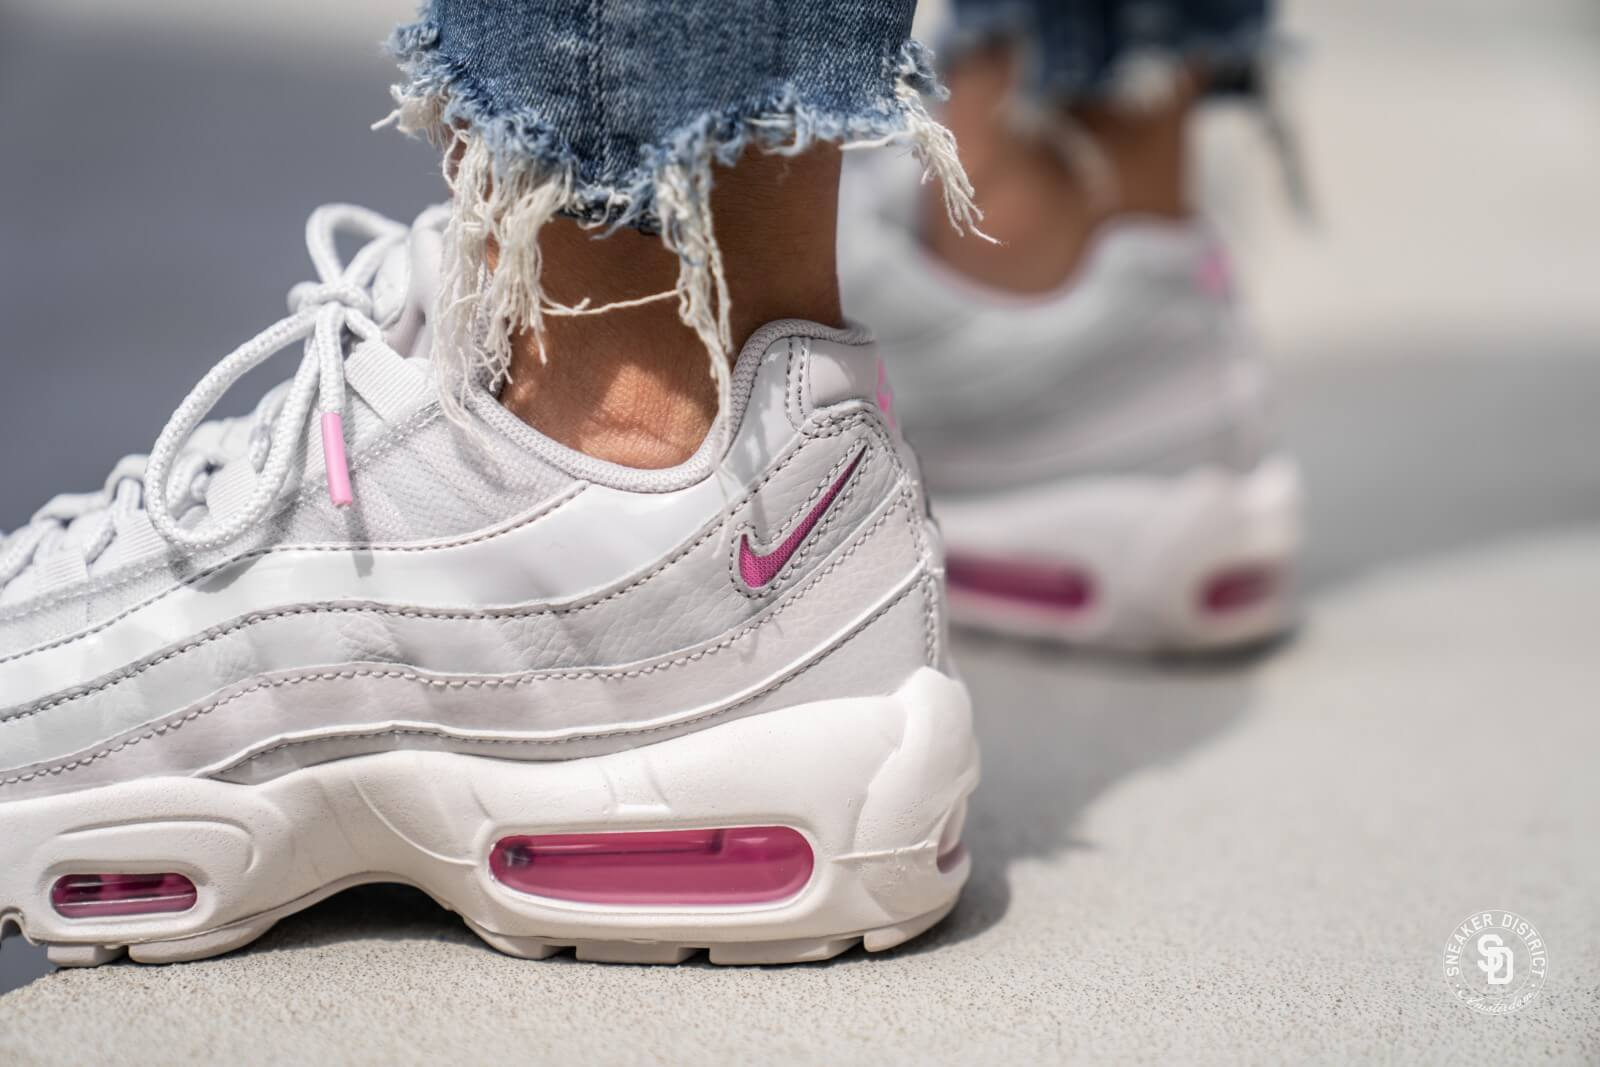 Nike Women S Air Max 95 Se Vast Grey Psychic Pink Summit White